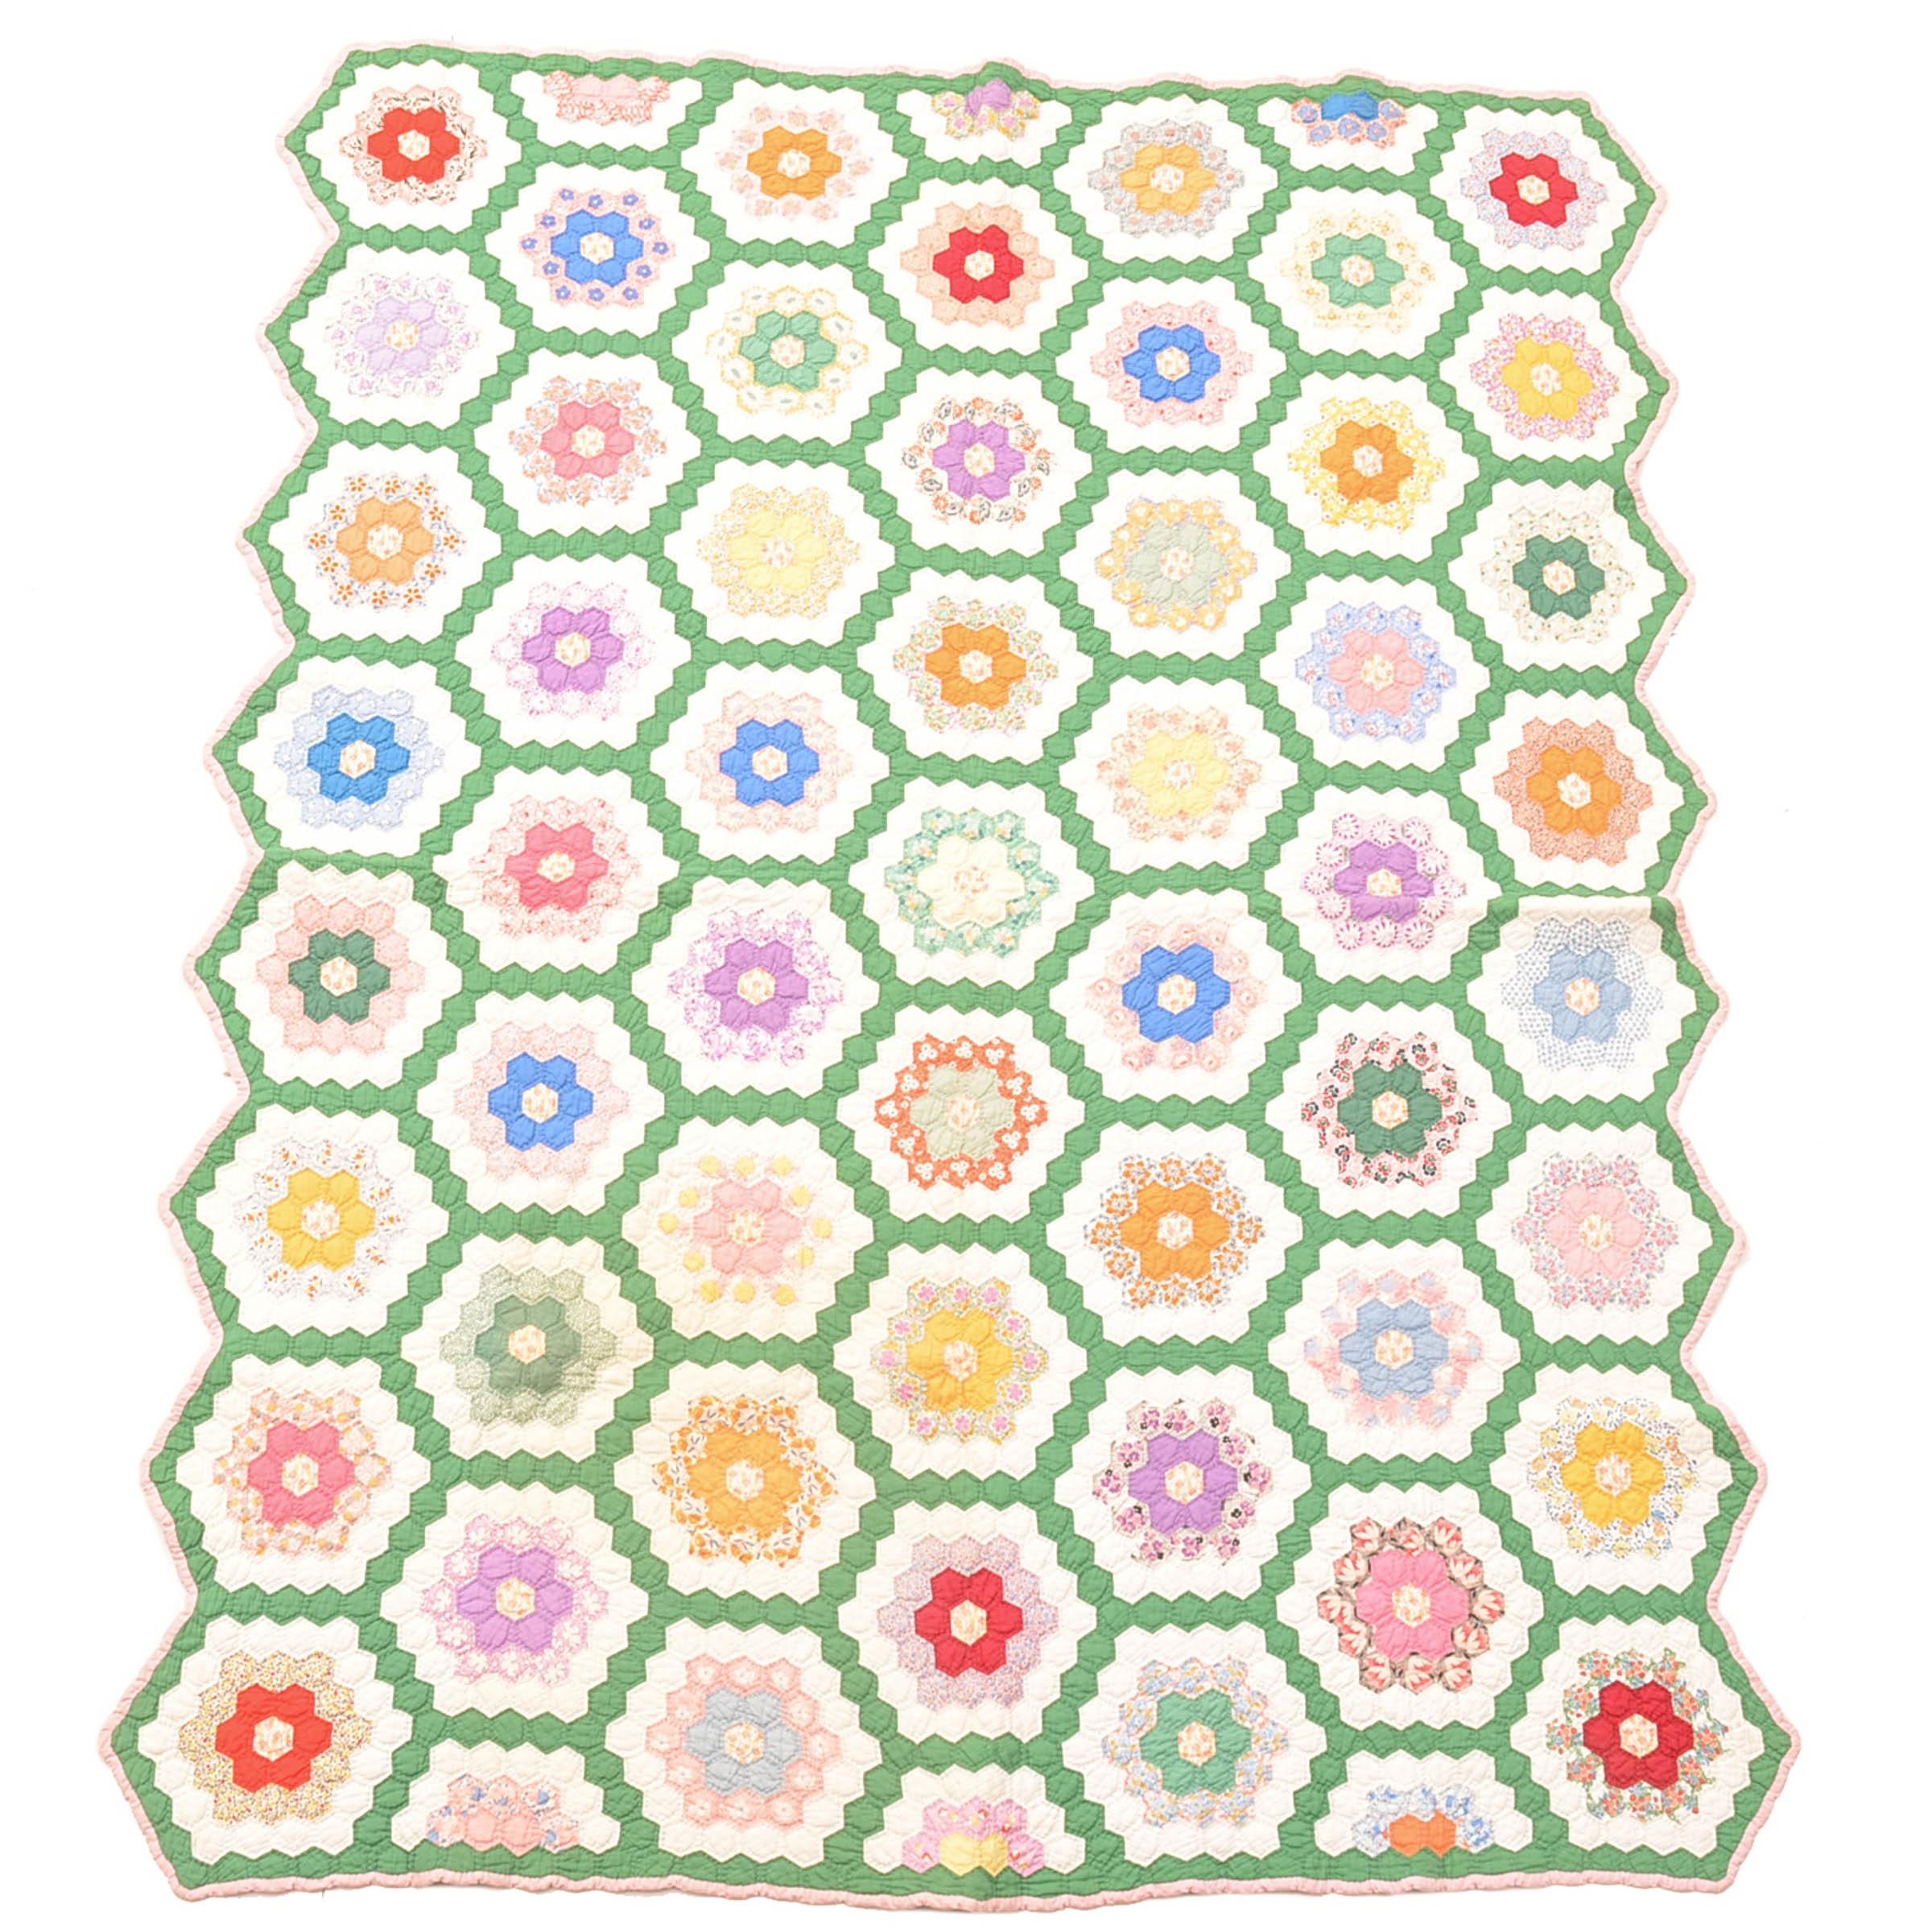 Vintage Floral Garden Decorative Quilt